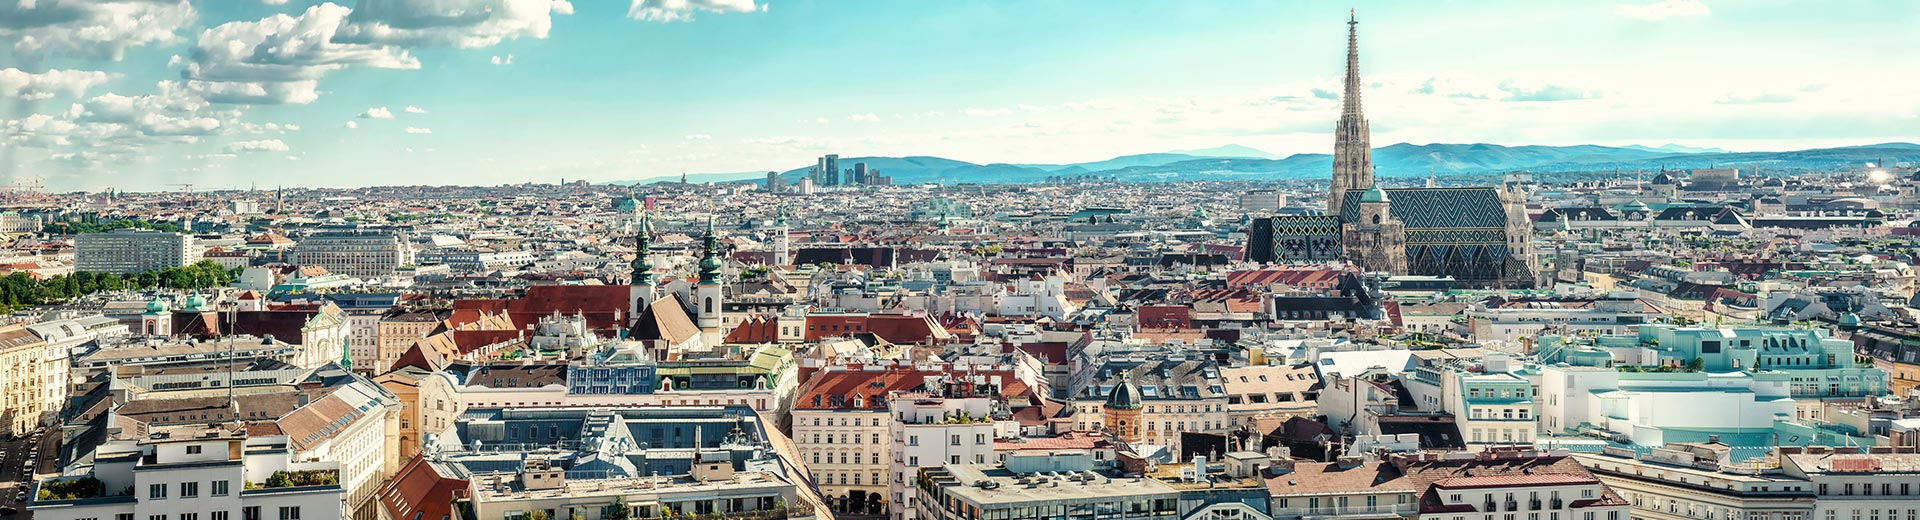 Gruppenreise Wien